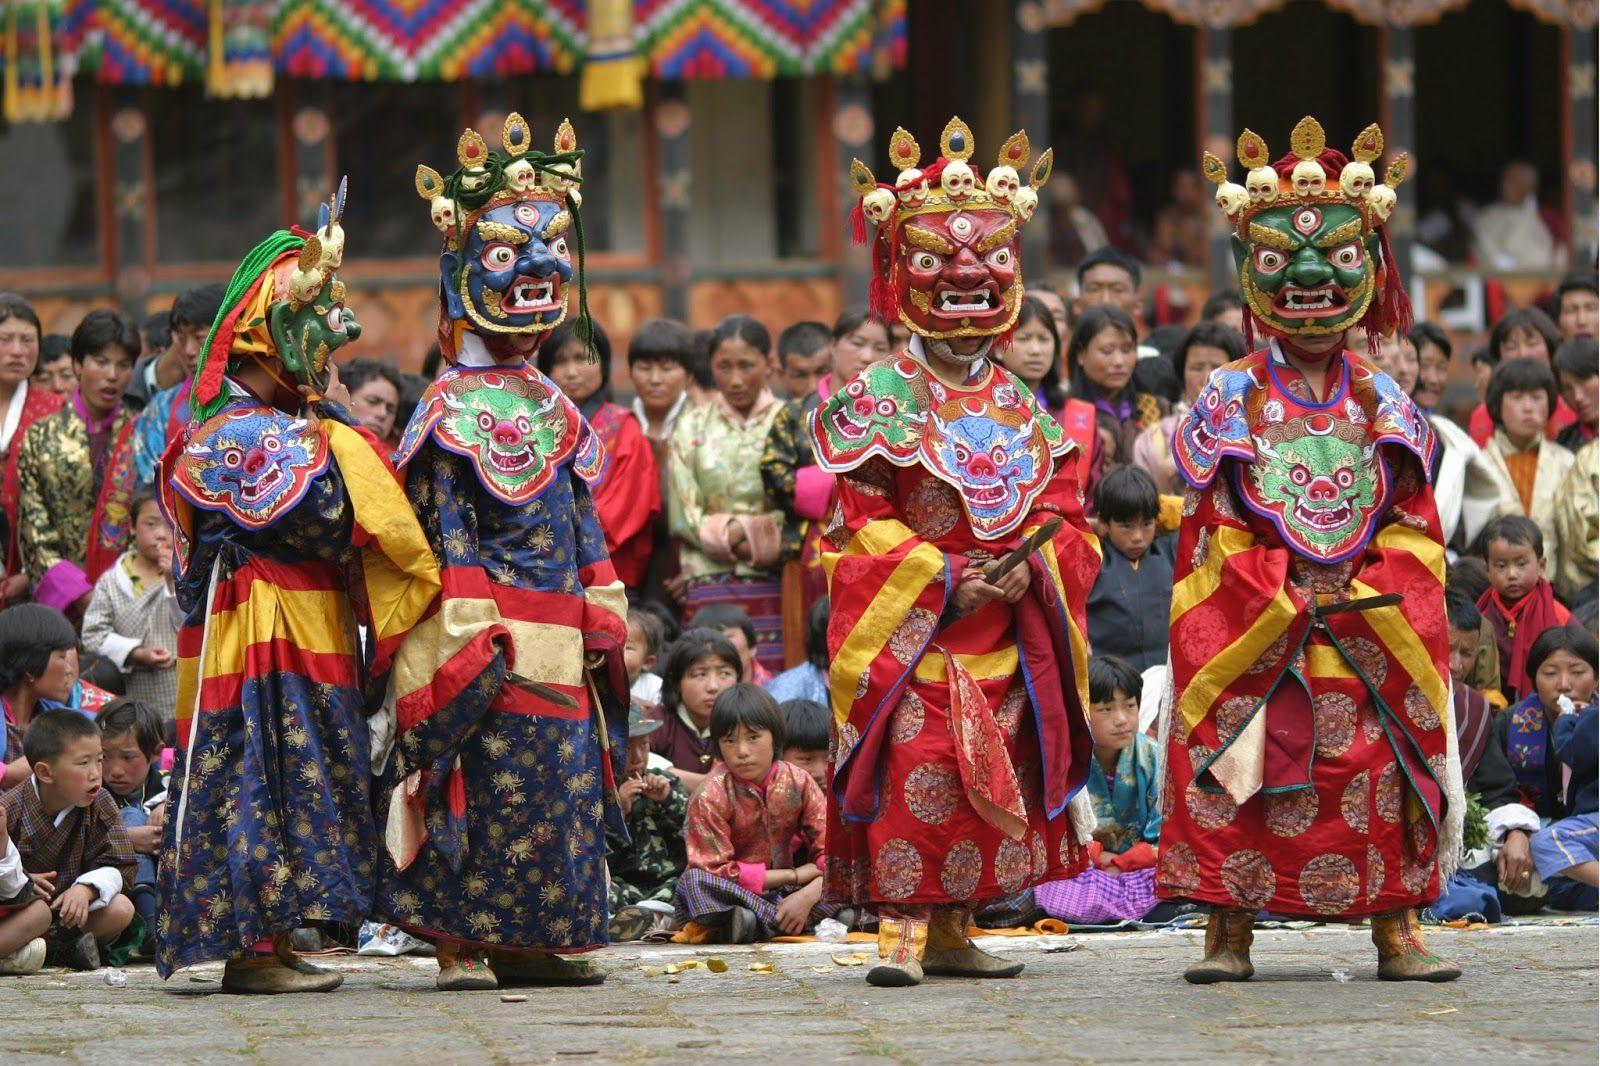 ArunachalPradesh FolkDance Bardo Chham is a folk dance